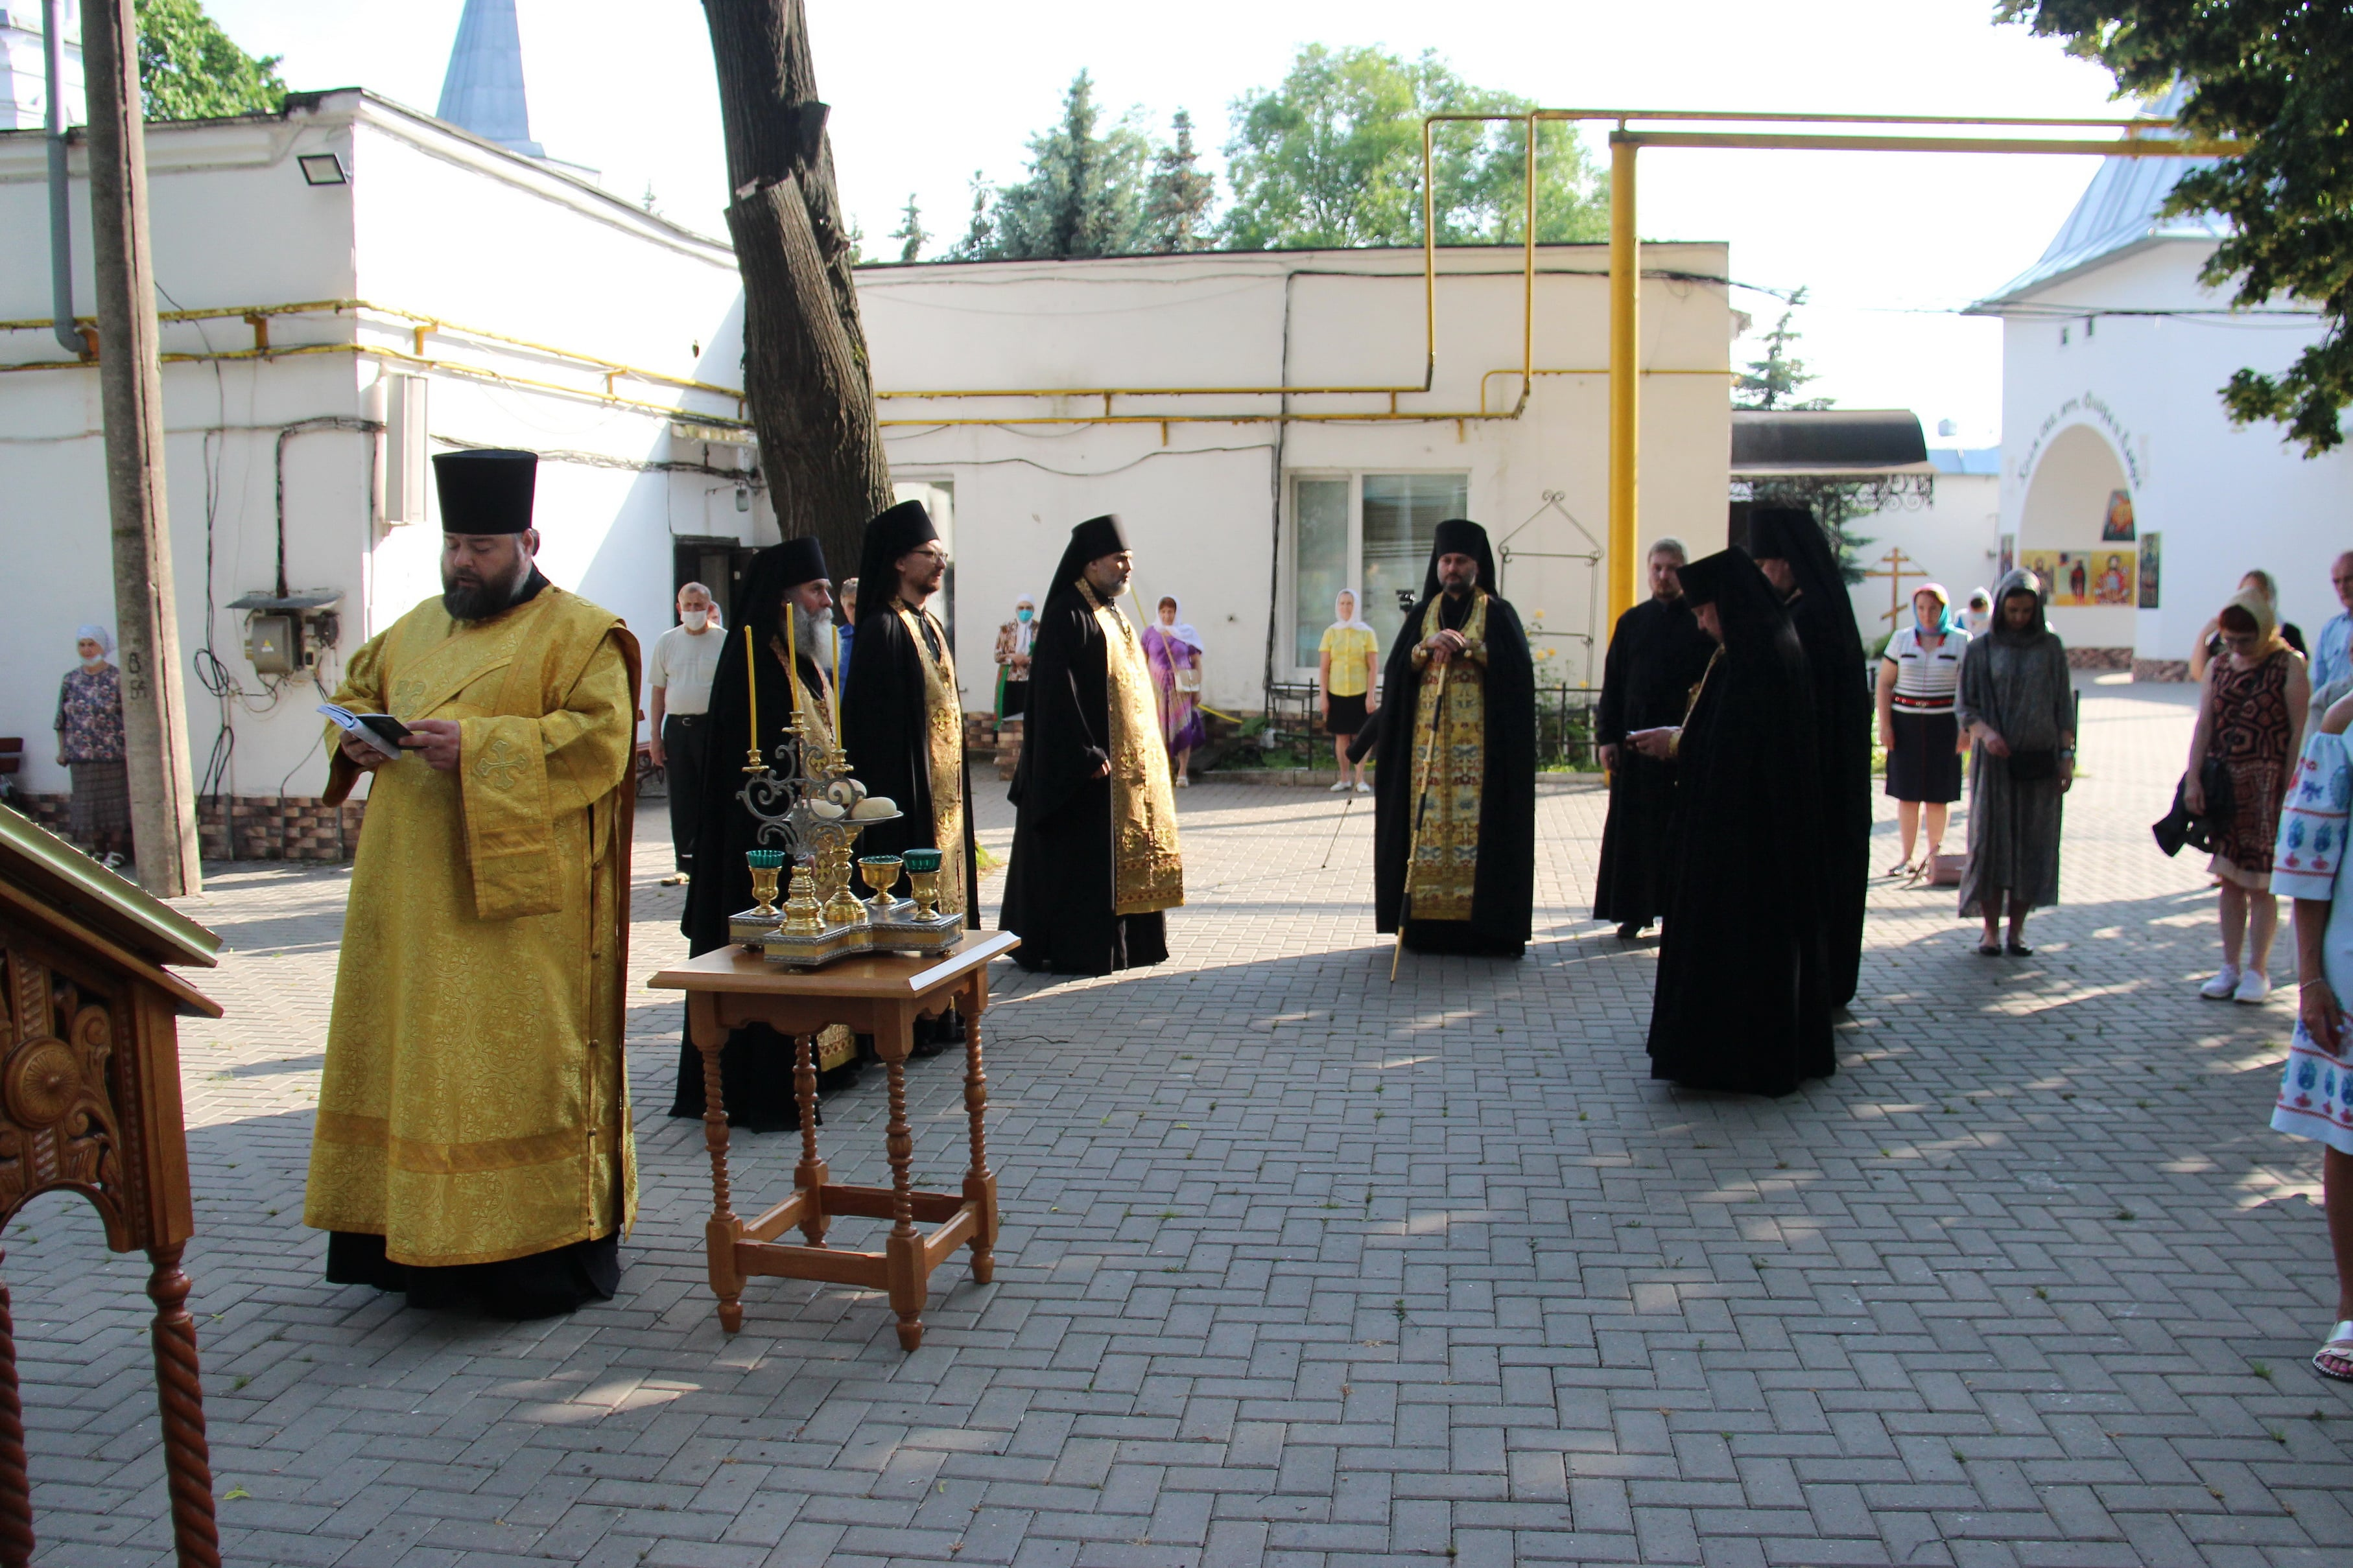 http://monuspen.ru/photoreports/9d553e3cea426a8390cd62a5f8fa5g00.JPG